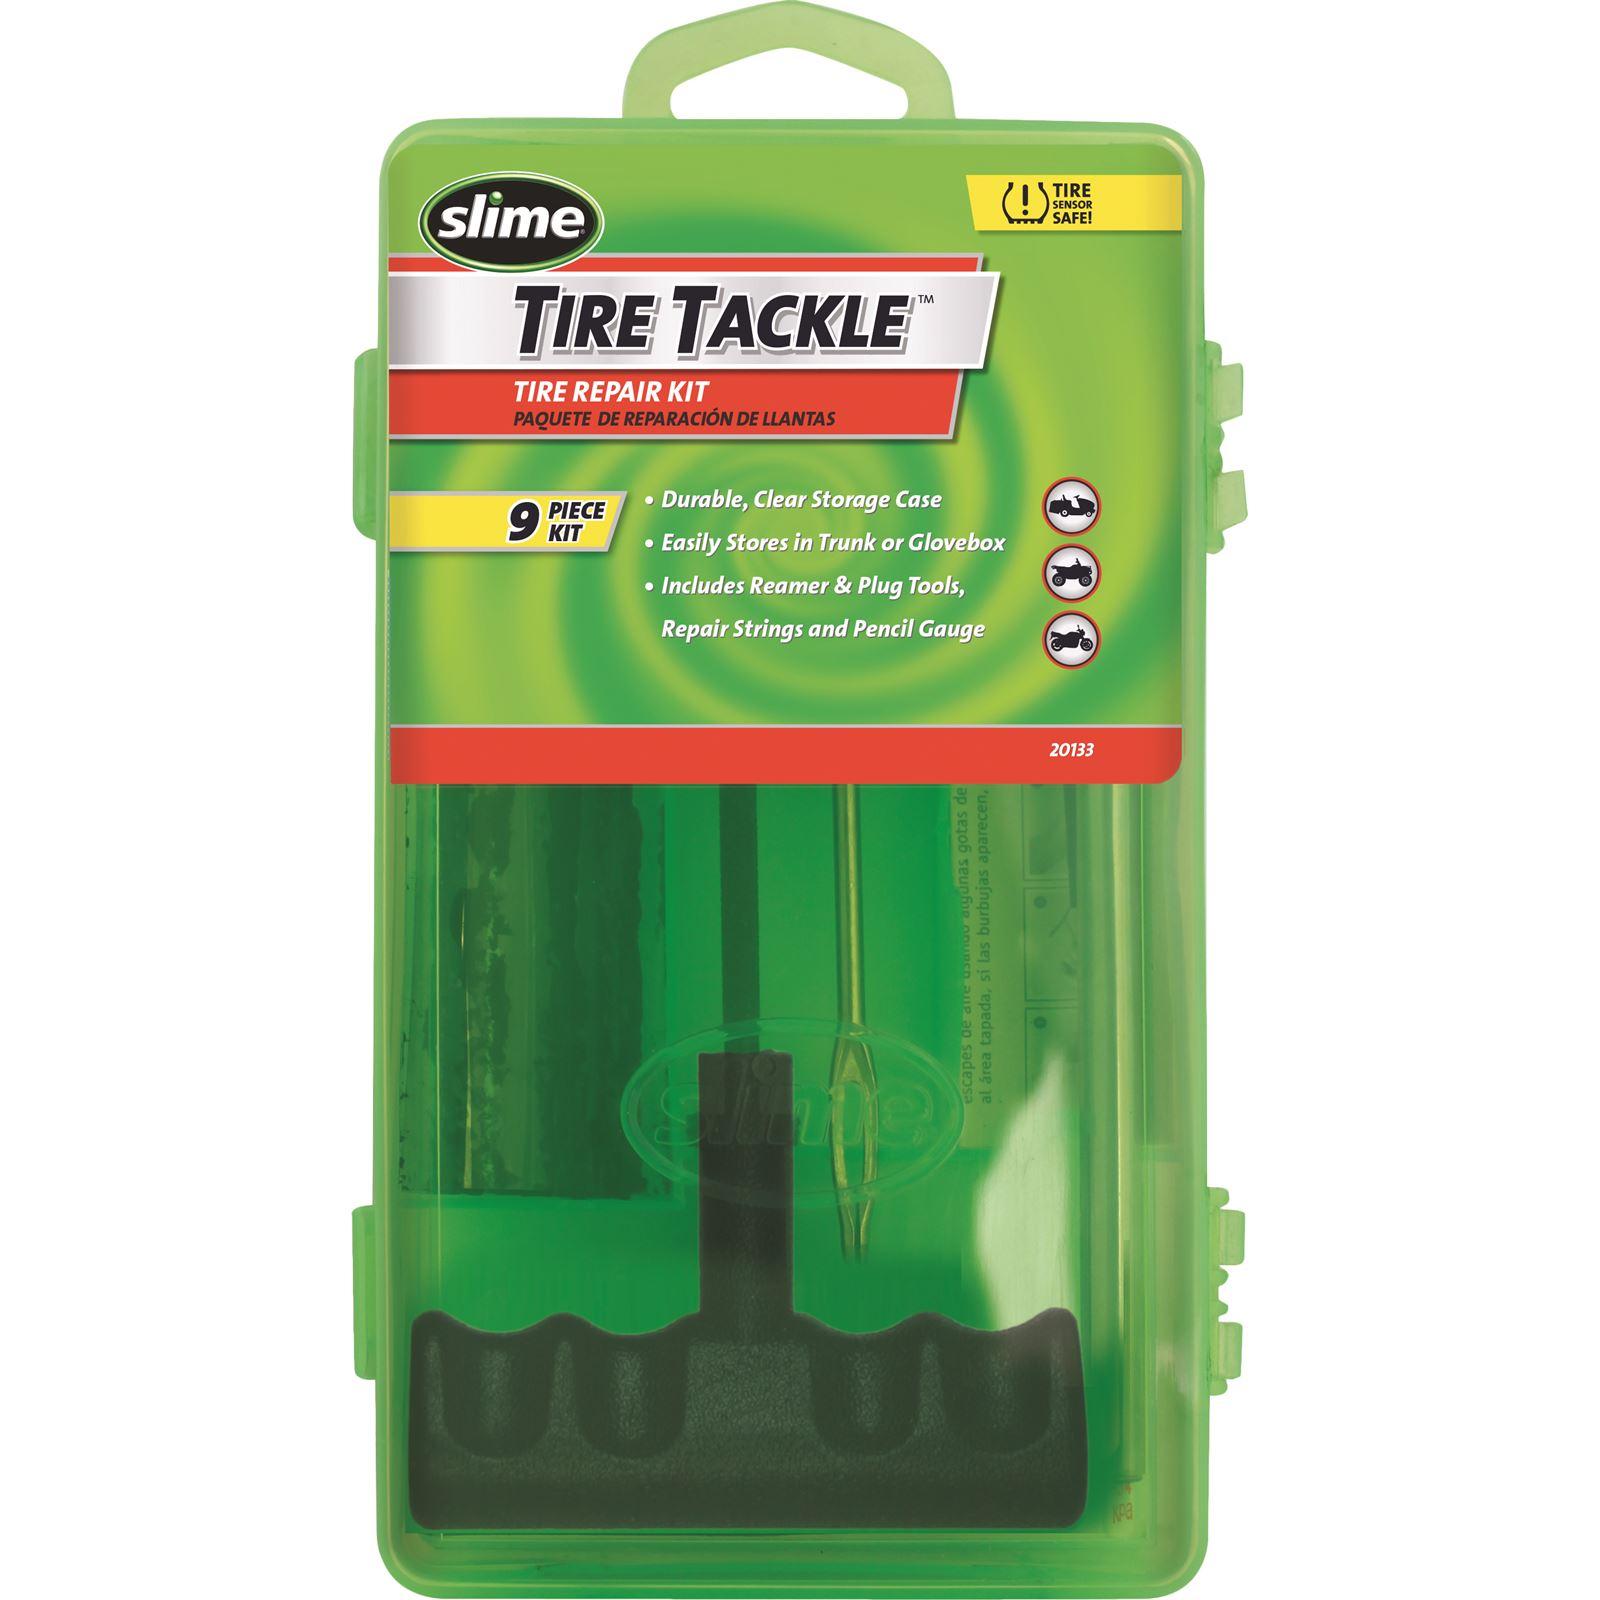 Slime Tire Tackle w/Box